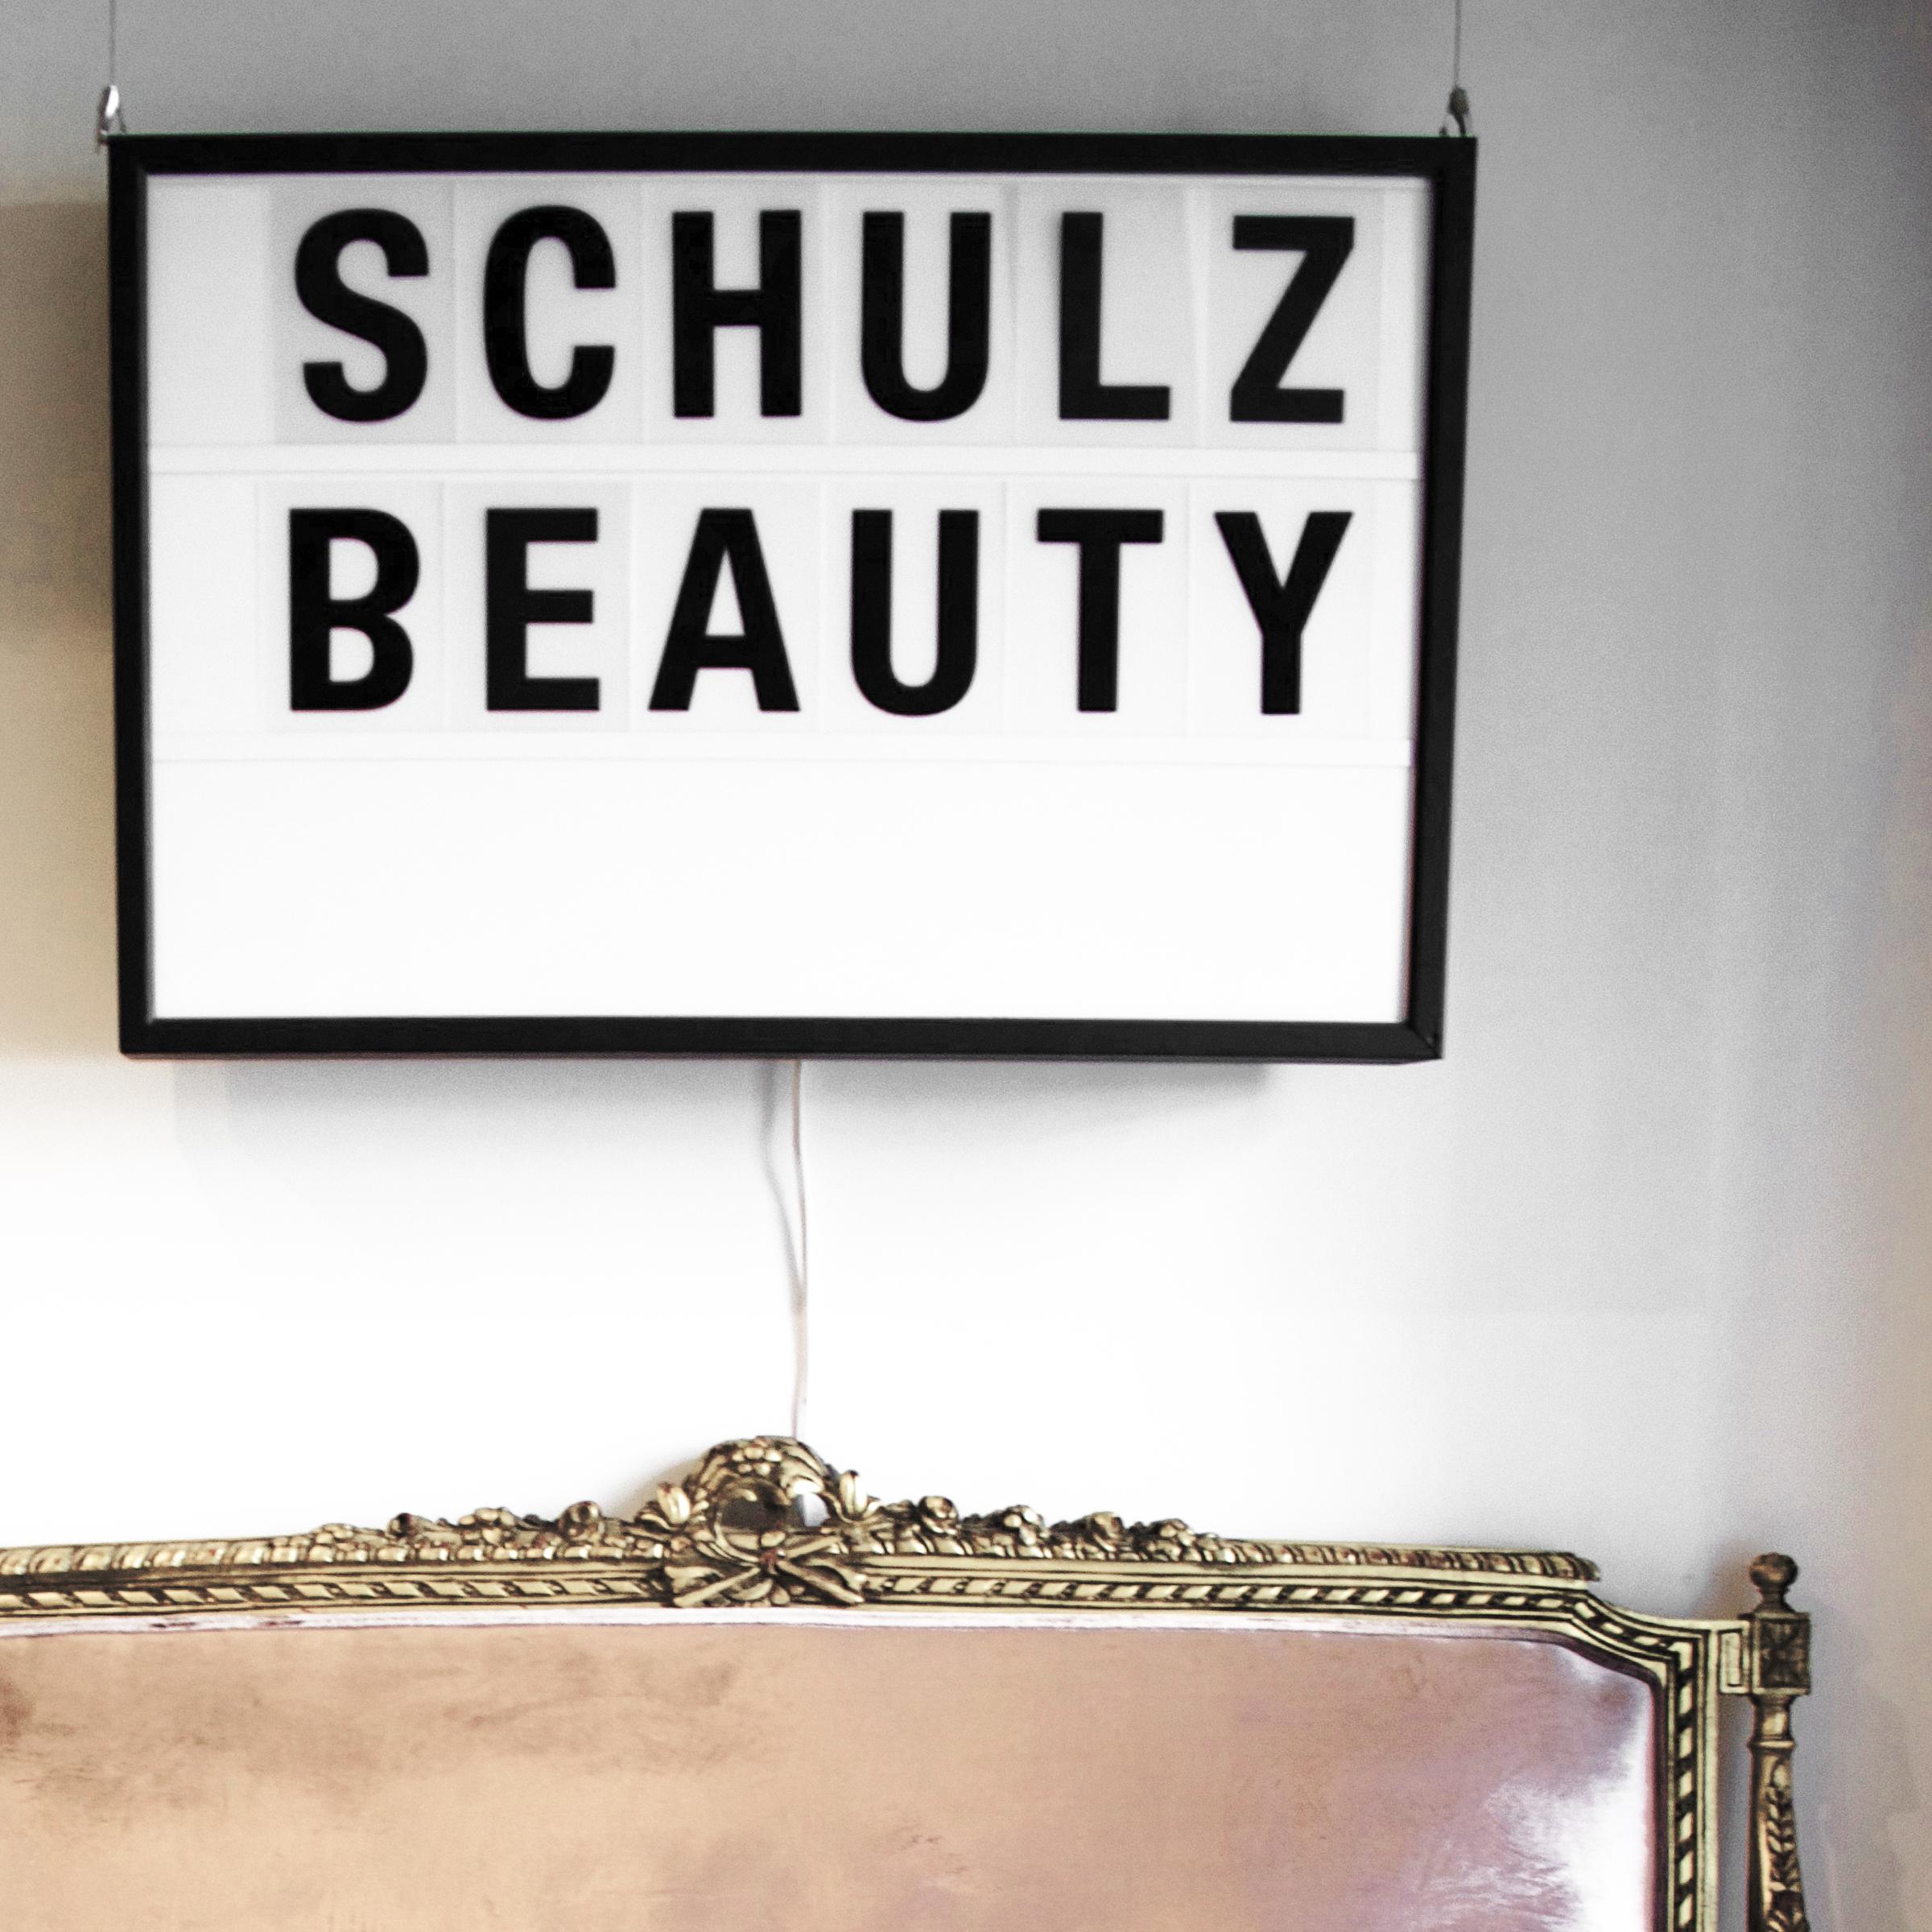 Schulz Beauty Spray Tan